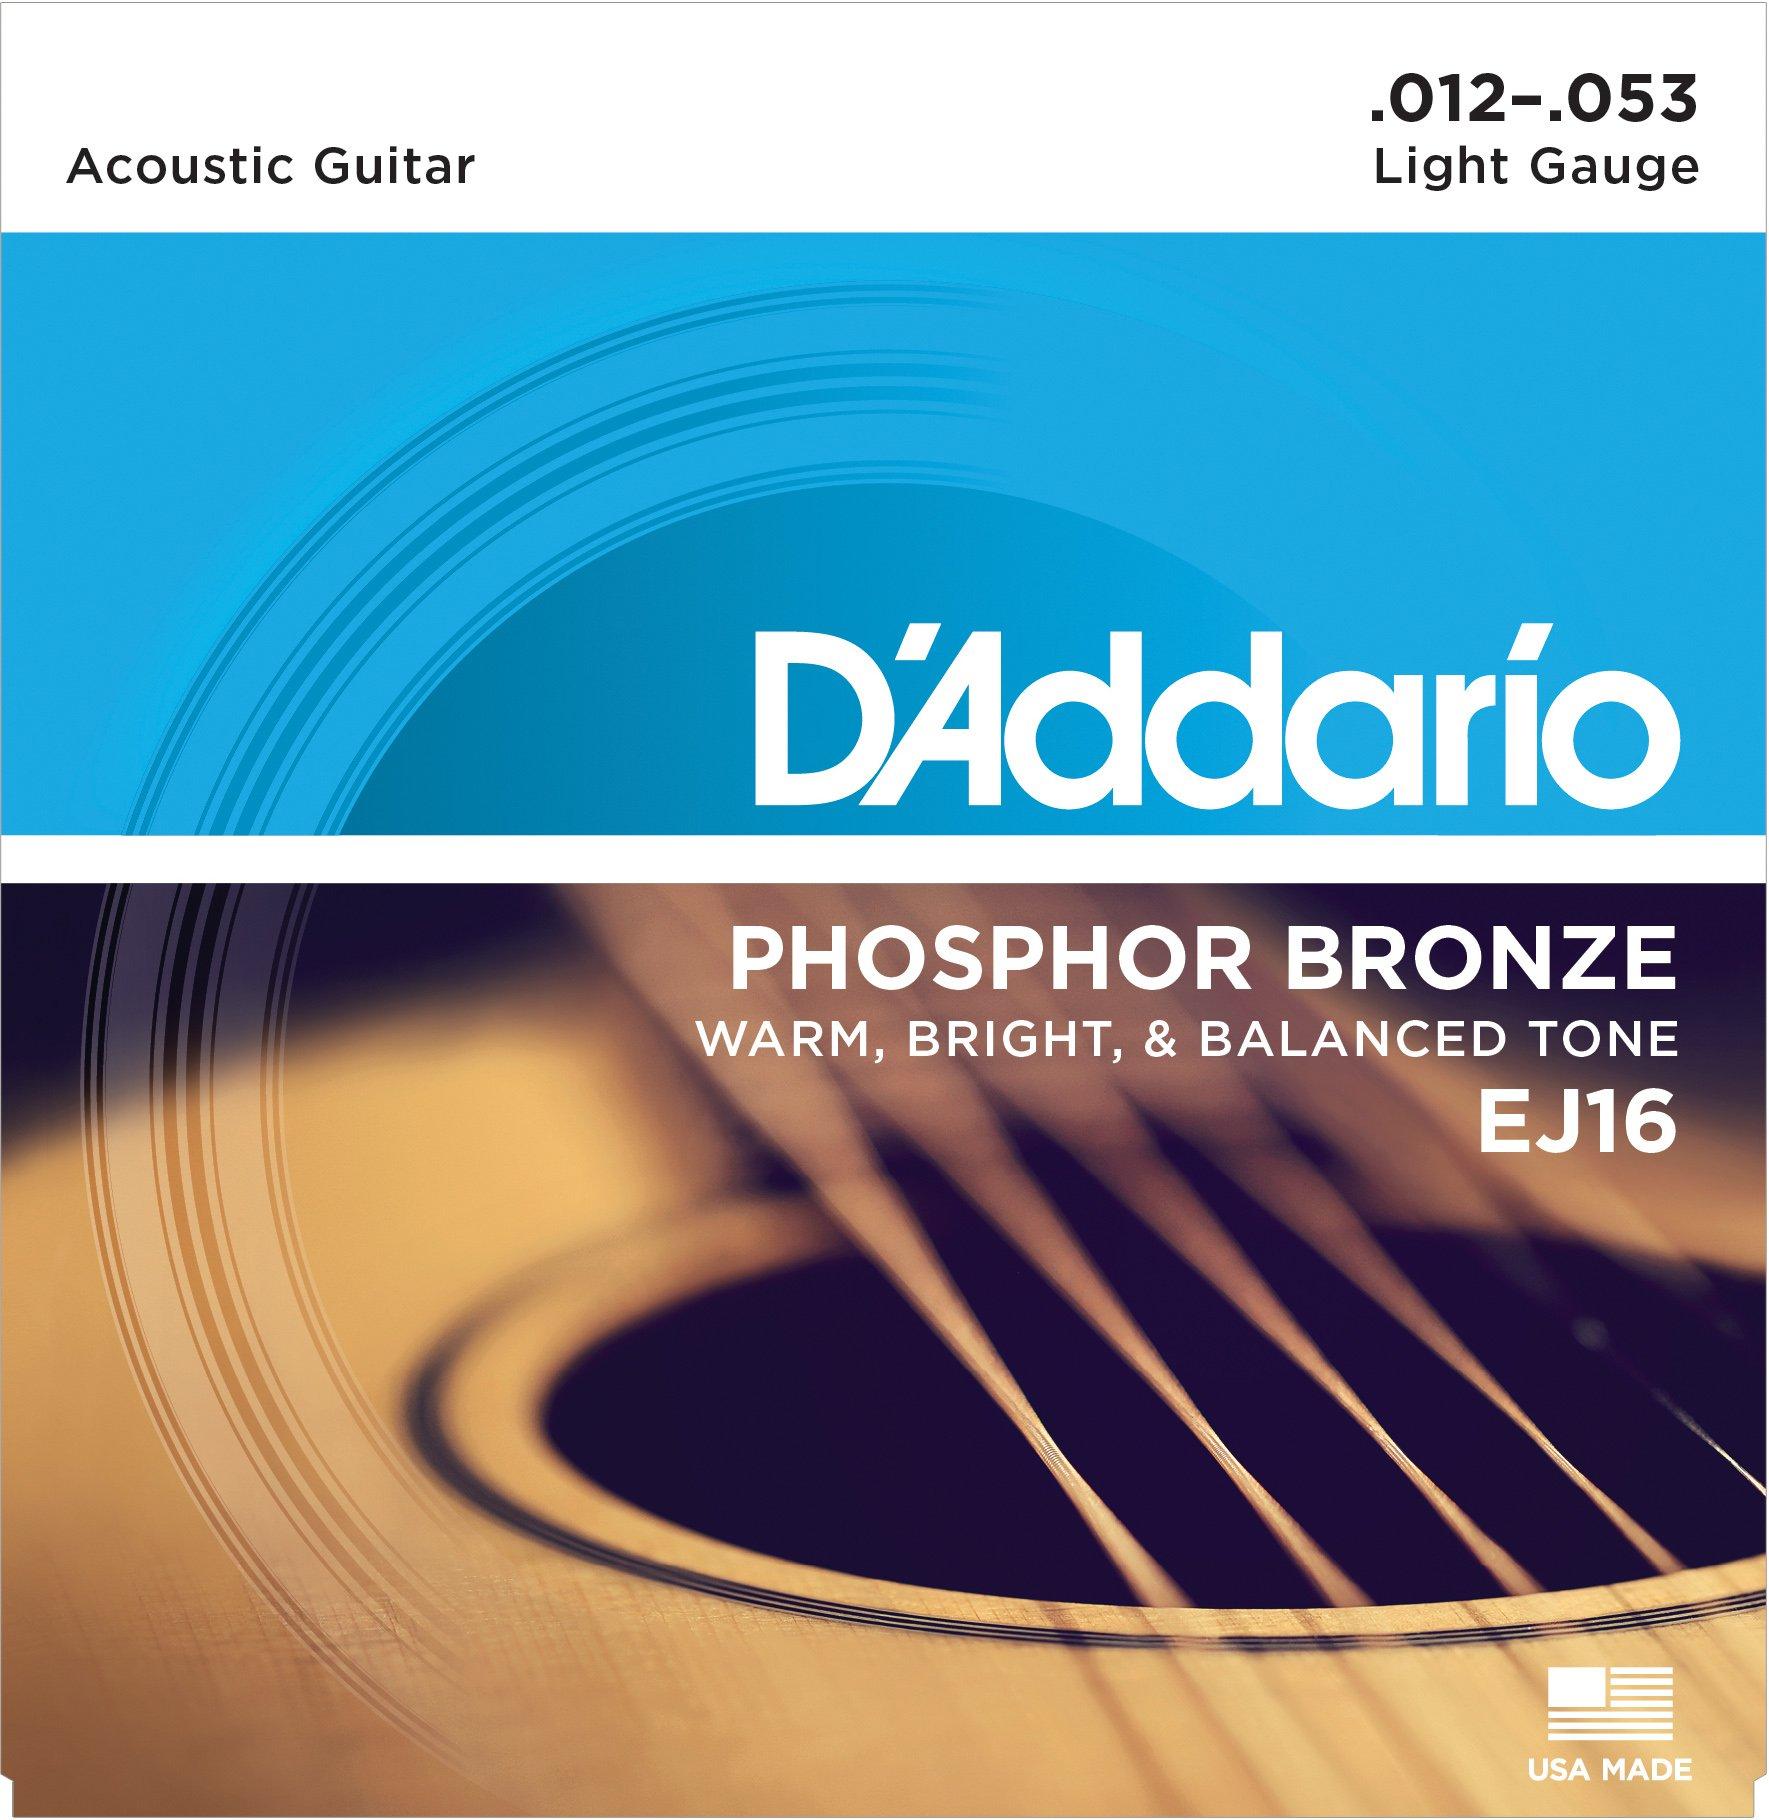 DAddario EJ16 - Juego de Cuerdas para Guitarra Acústica de Fósforo/Bronce,